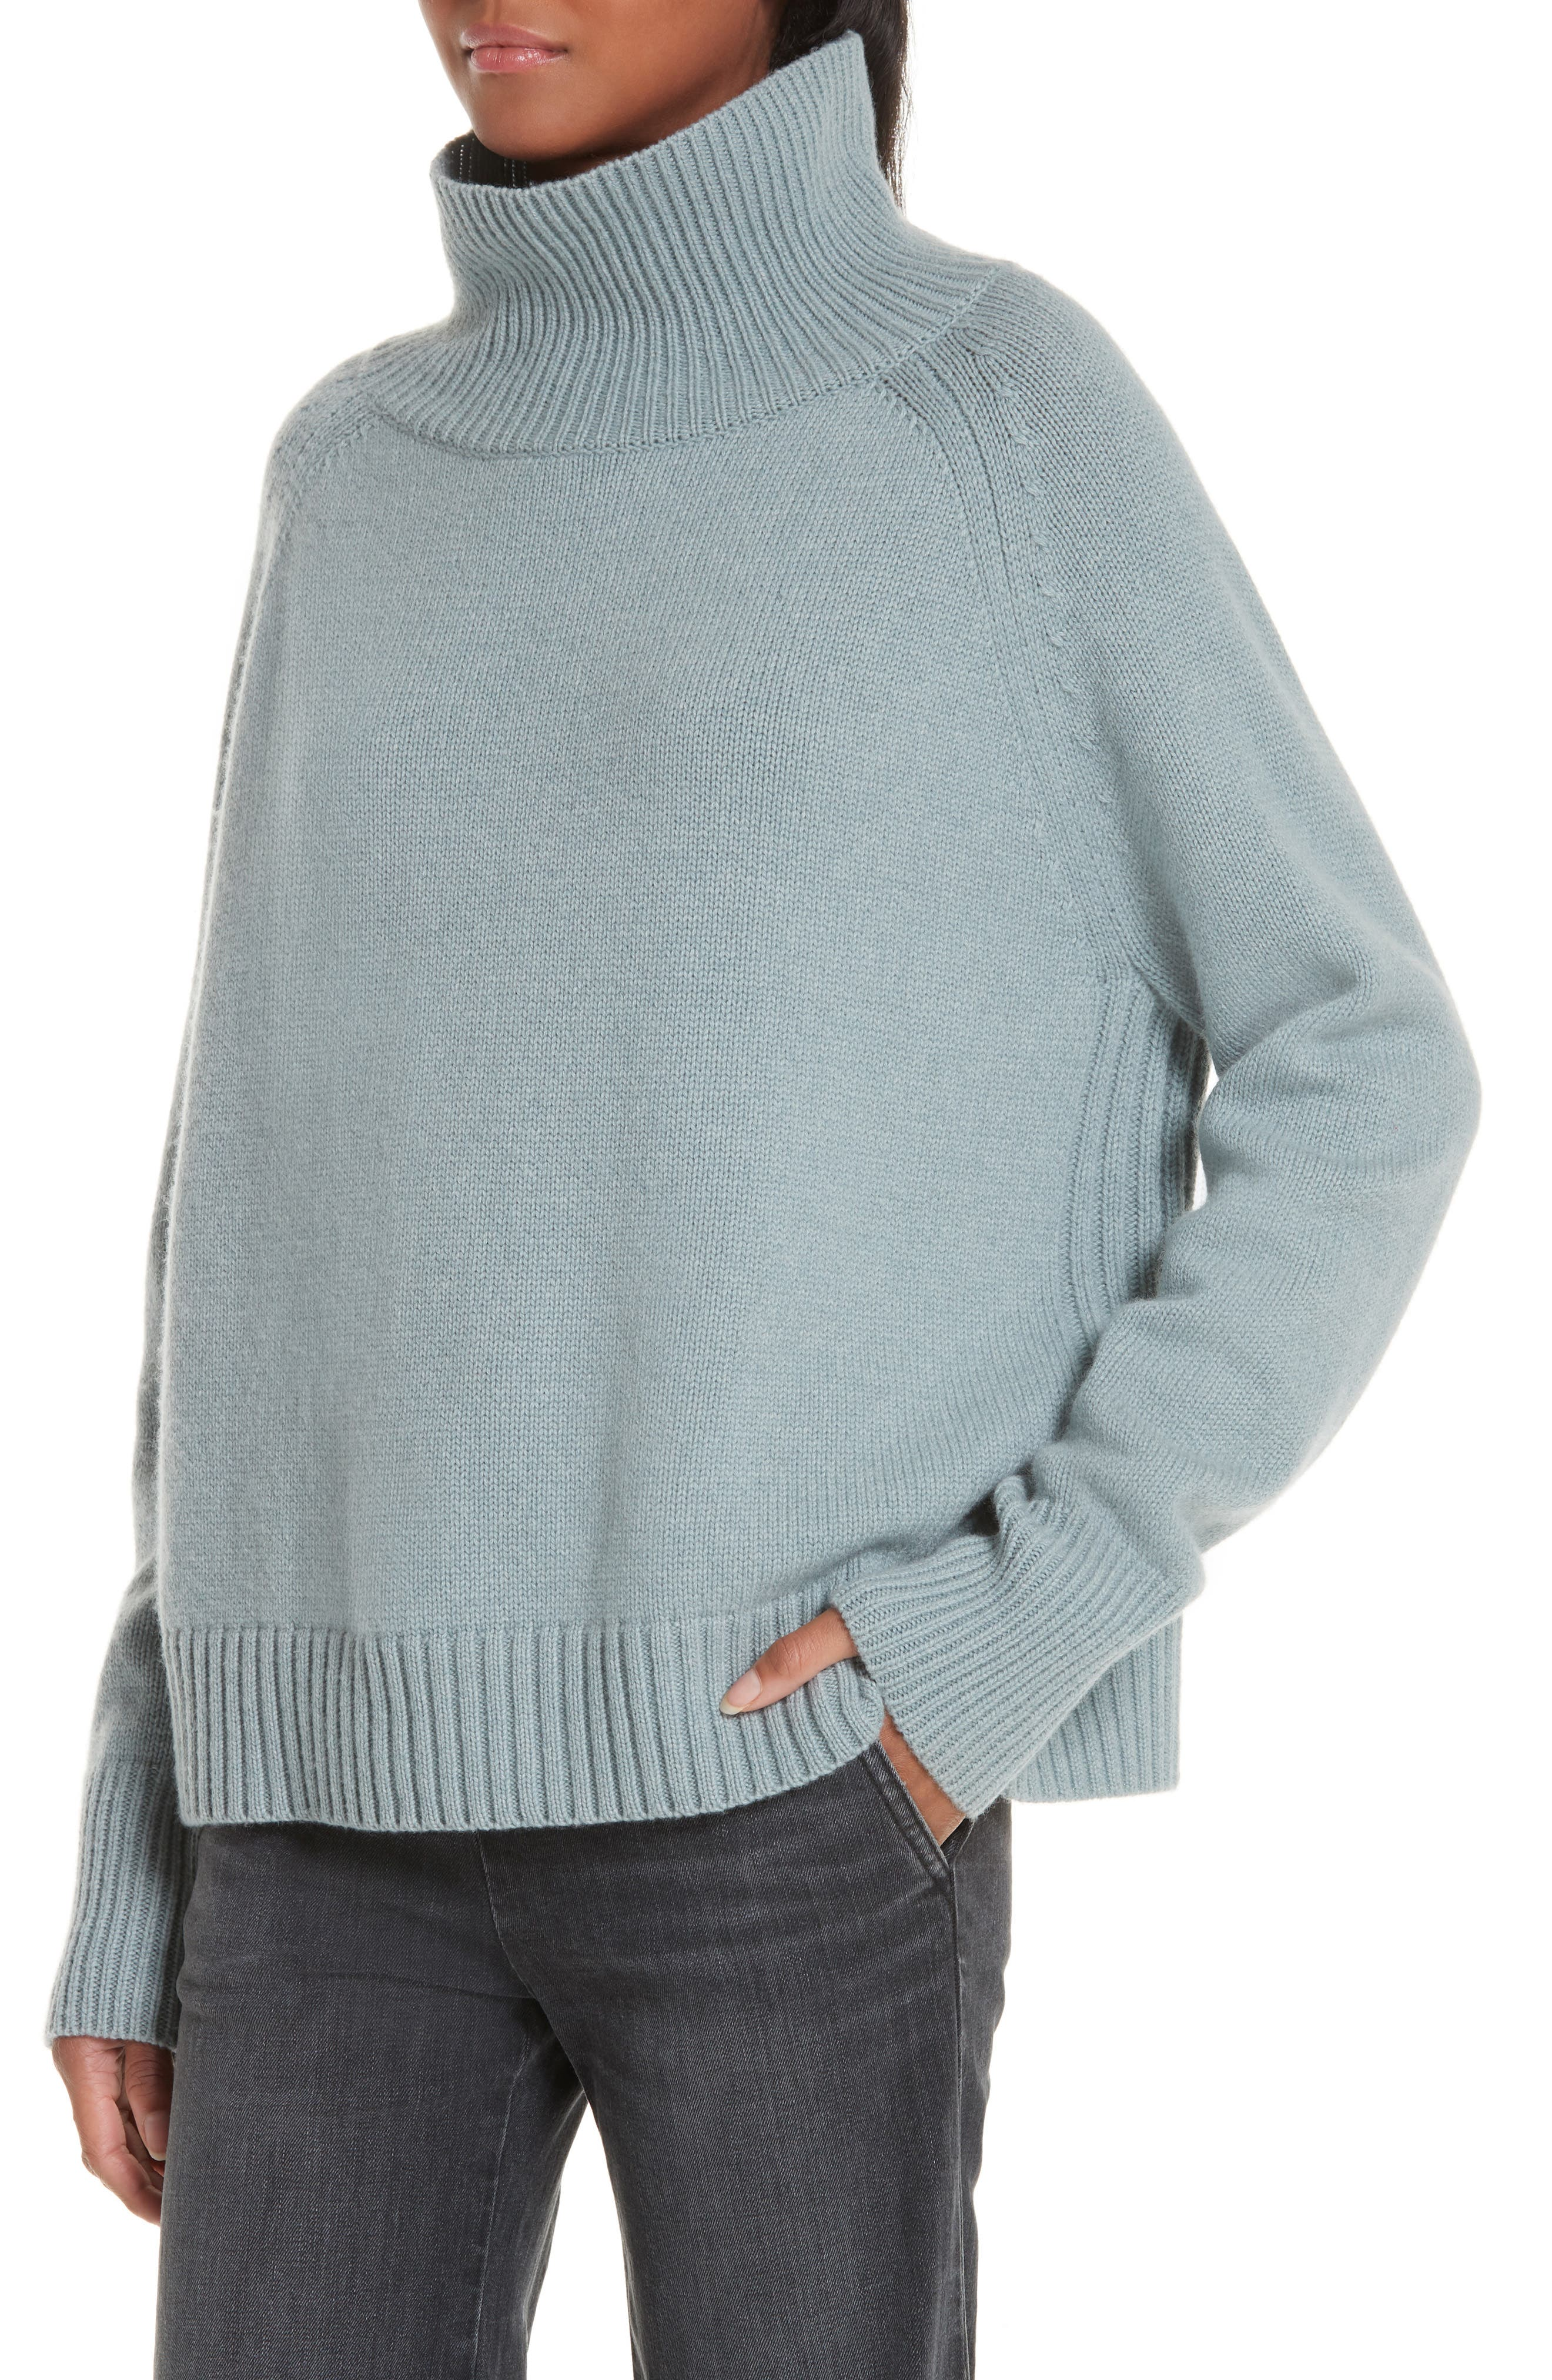 NILI LOTAN, Mariah Funnel Neck Cashmere Sweater, Alternate thumbnail 4, color, SKY BLUE